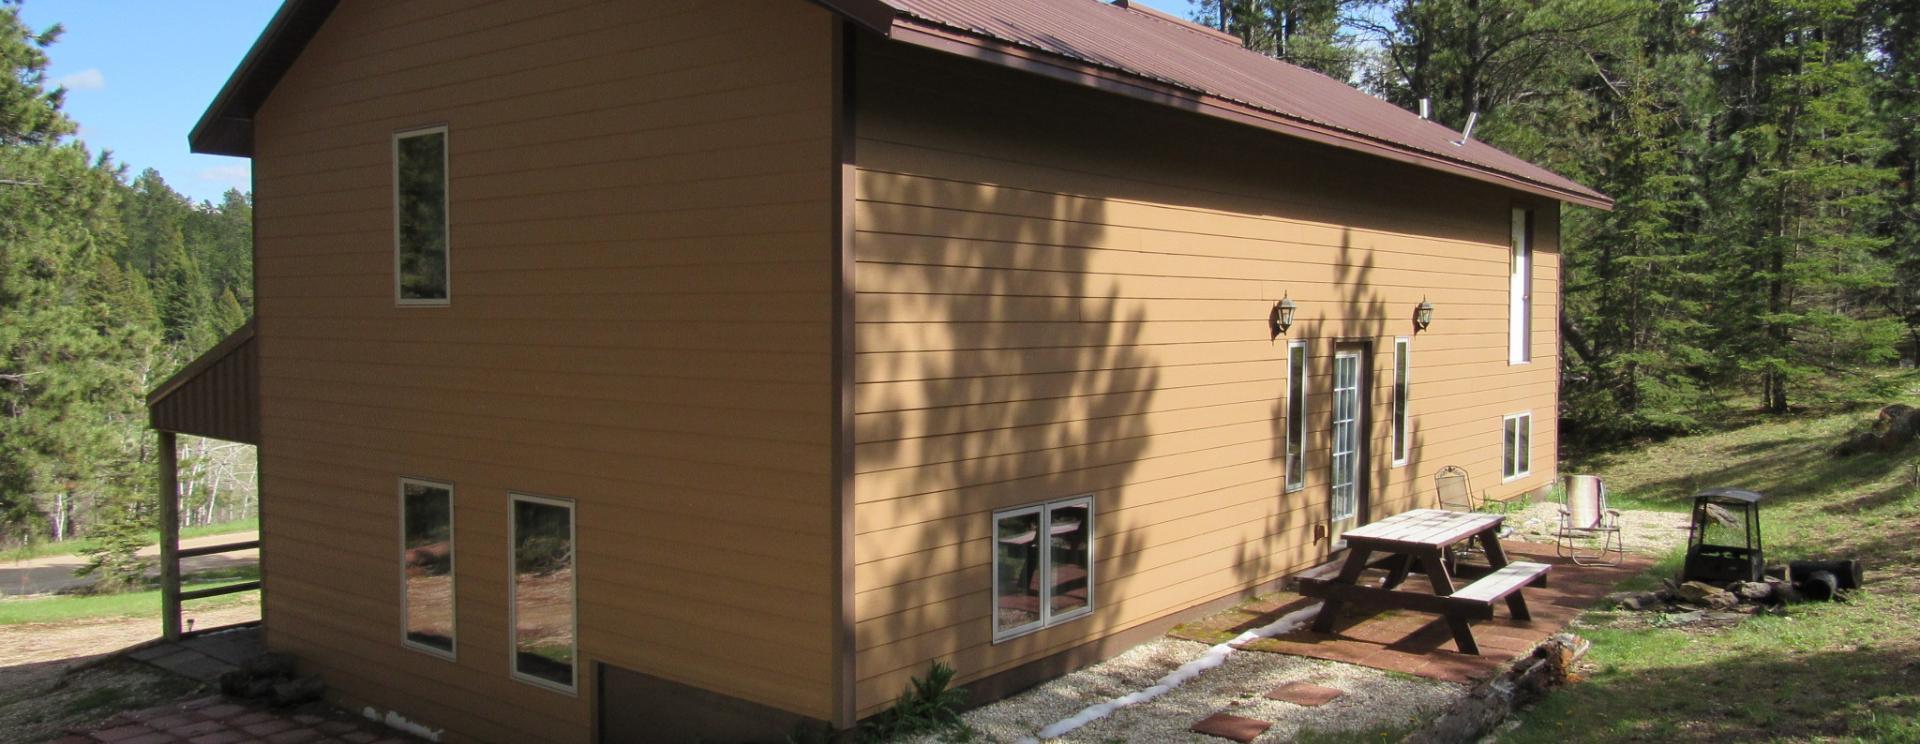 Twisted Timbers Lodge